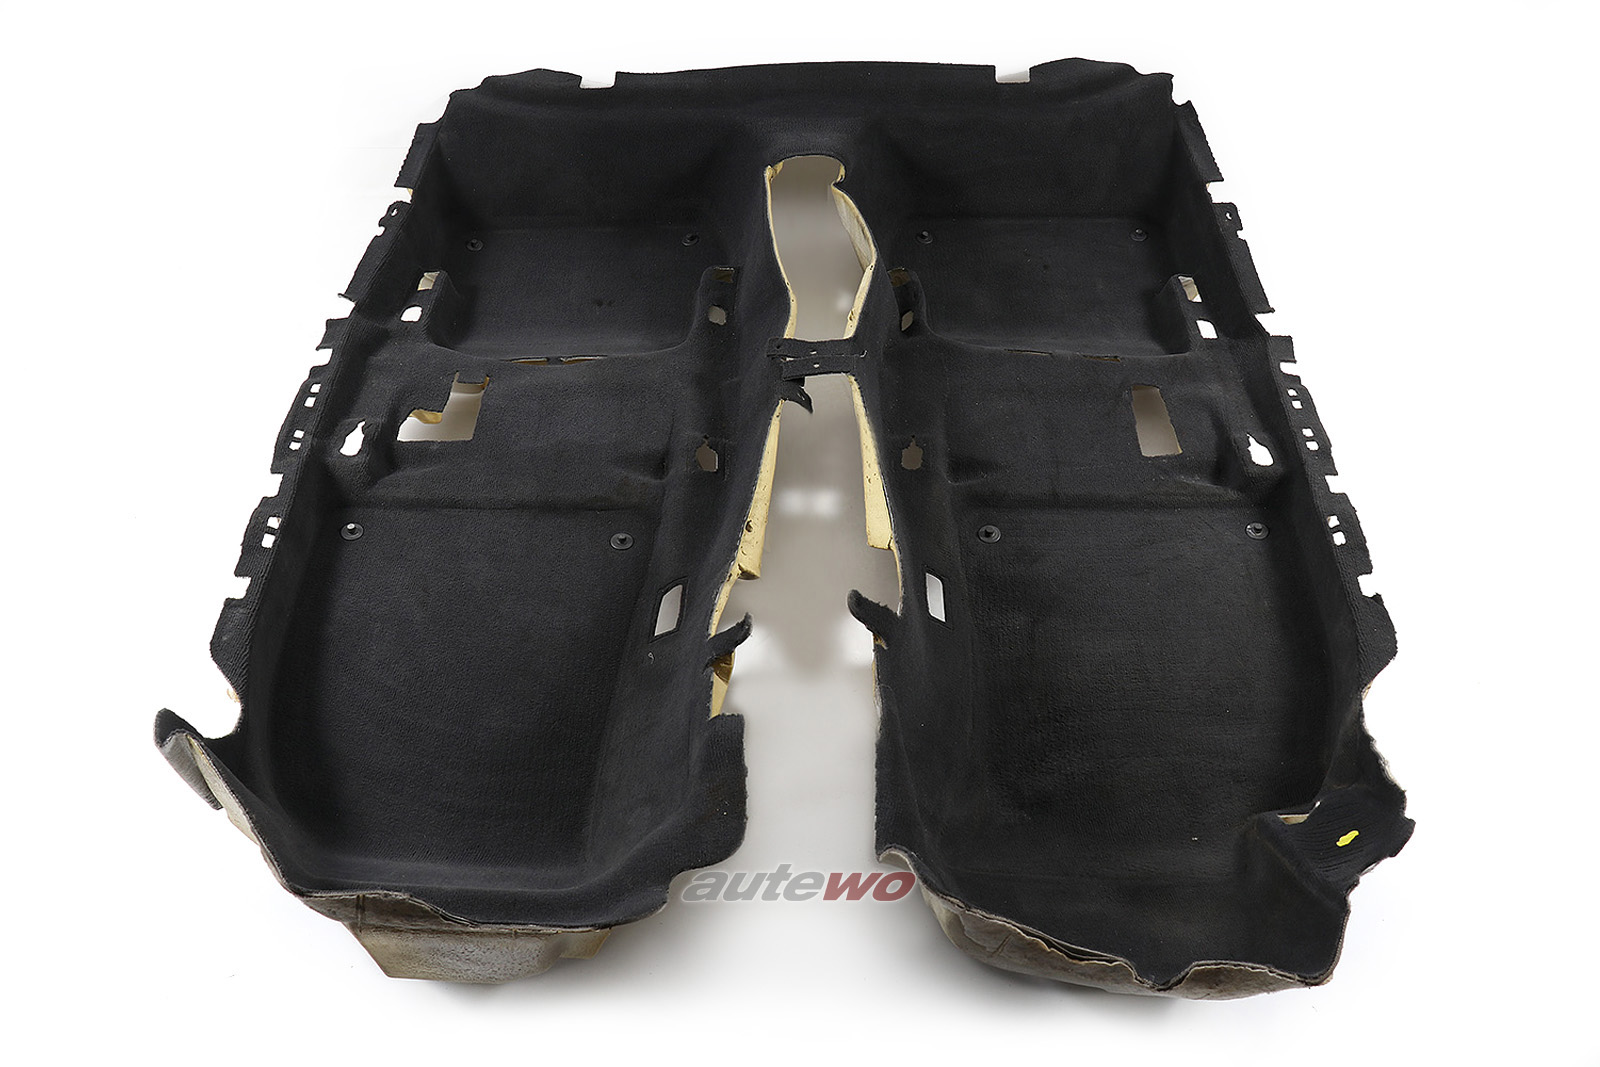 8E1863021 8E1863021L Audi A4/S4/RS4 8E/B6/B7 Innenraum Teppich schwarz